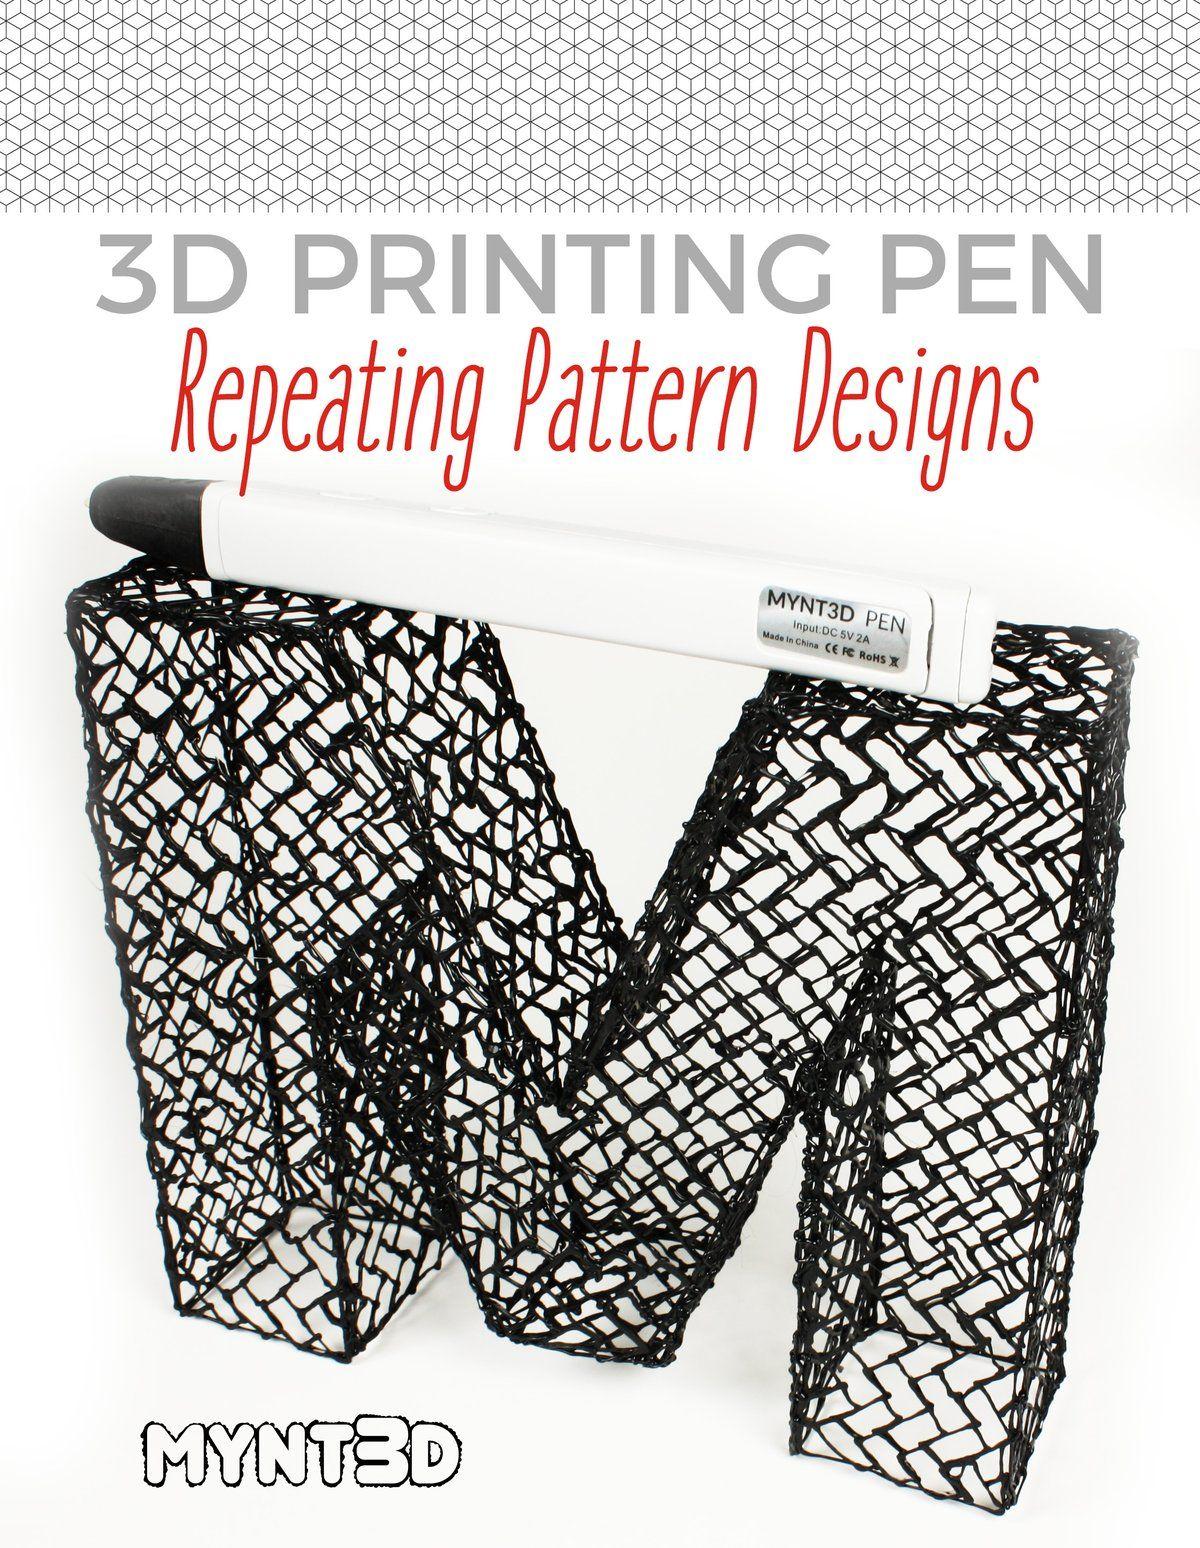 Design Patterns To Draw In 3d 3d Drawings 3d Pen Stencils 3d Pen